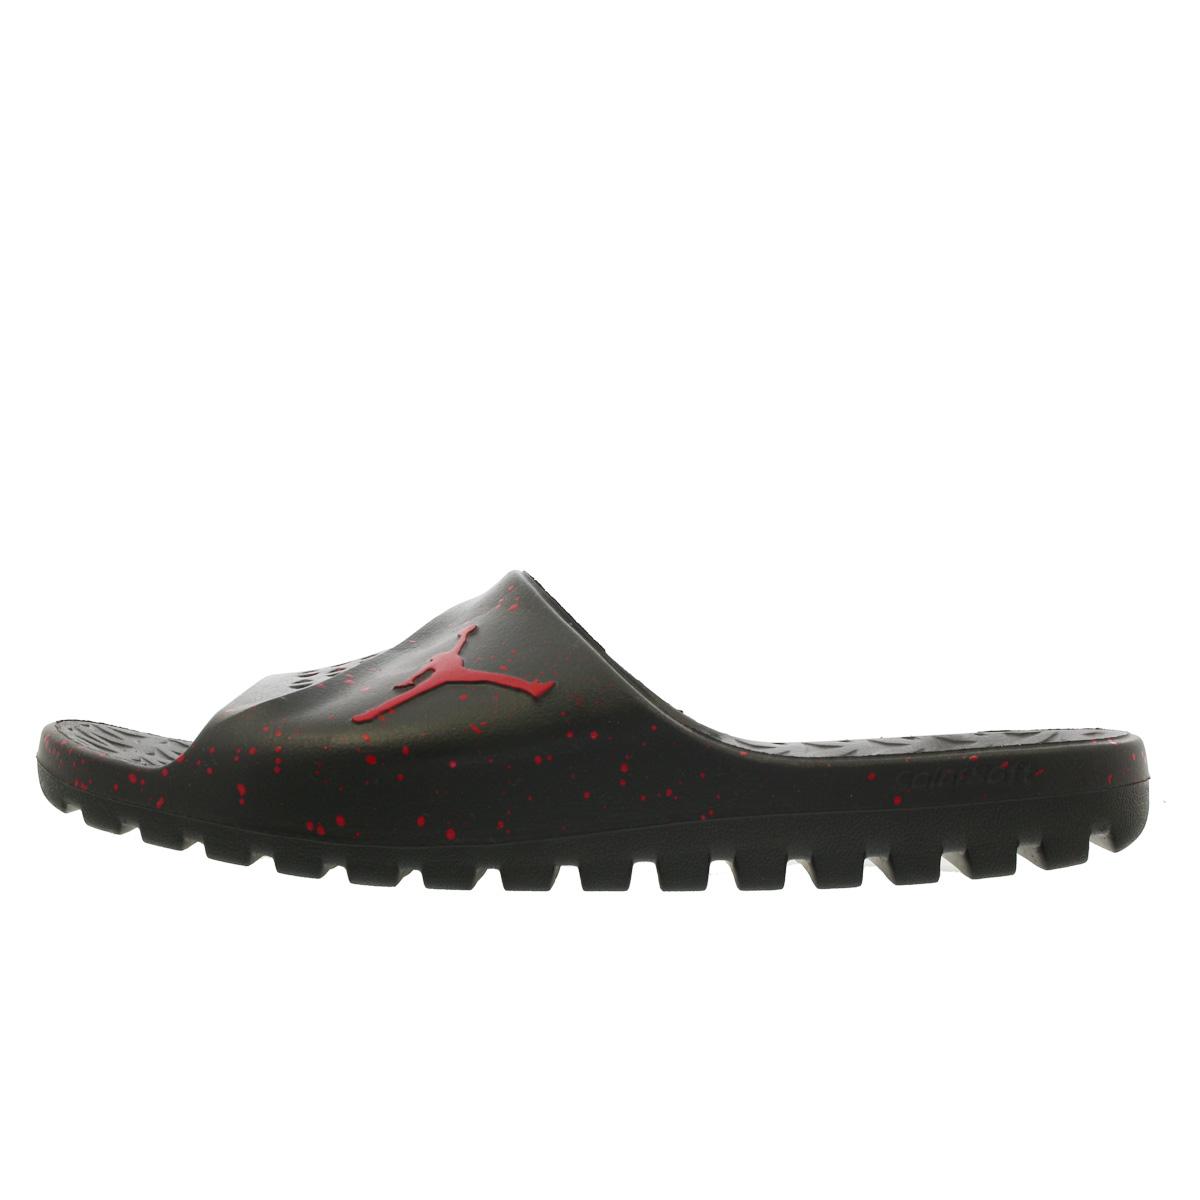 9ca83c5170a9 LOWTEX PLUS  NIKE JORDAN SUPER.FLY TEAM SLIDE Nike Jordan super fly ...